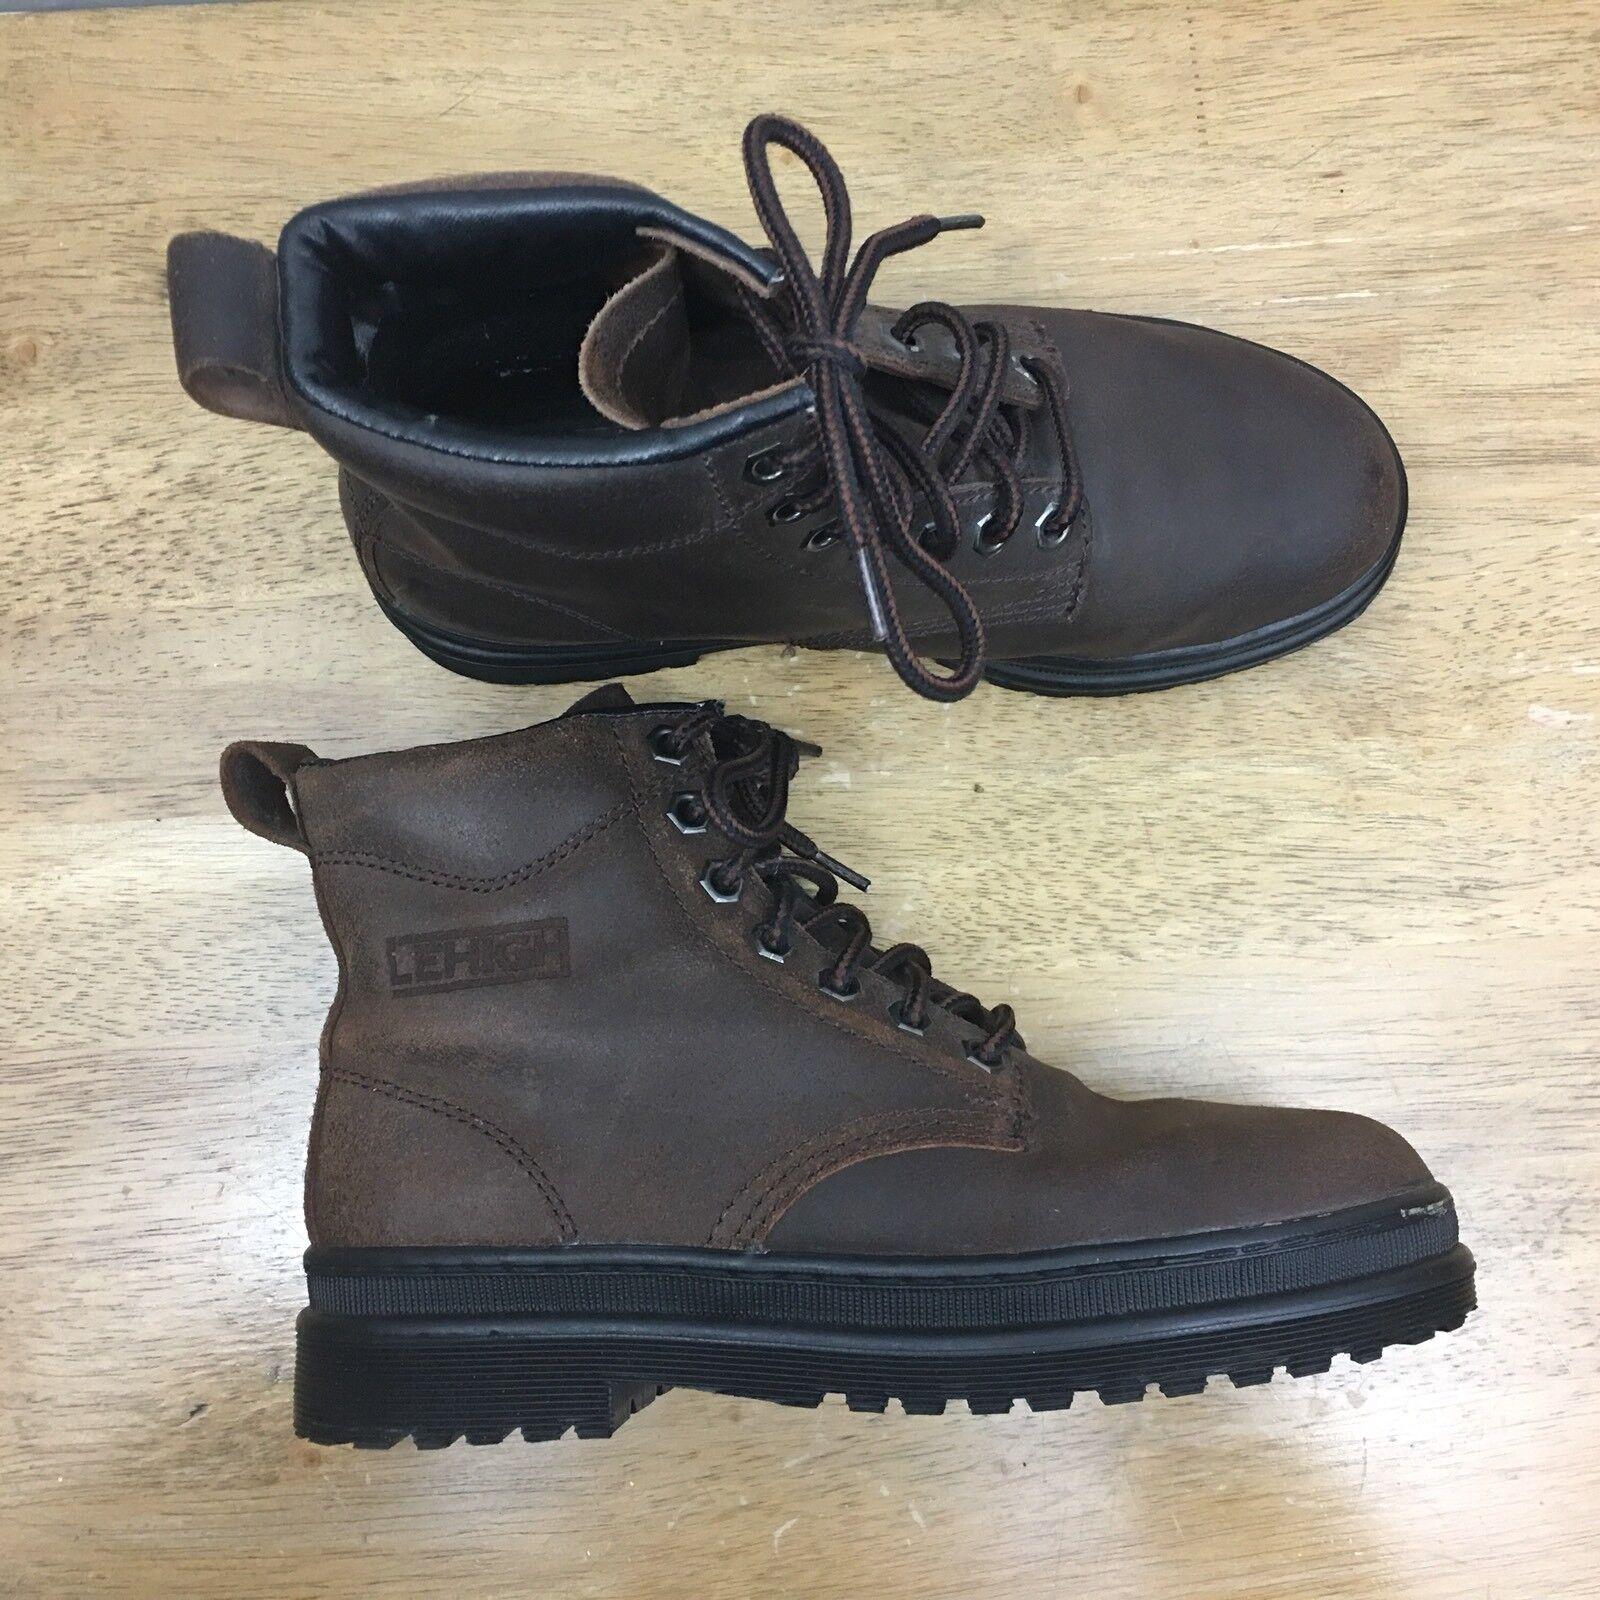 LeHigh Stiefel Damens's 8W Ansi Z41 Oil Resistant Braun Leder Safety Stiefel #SB08